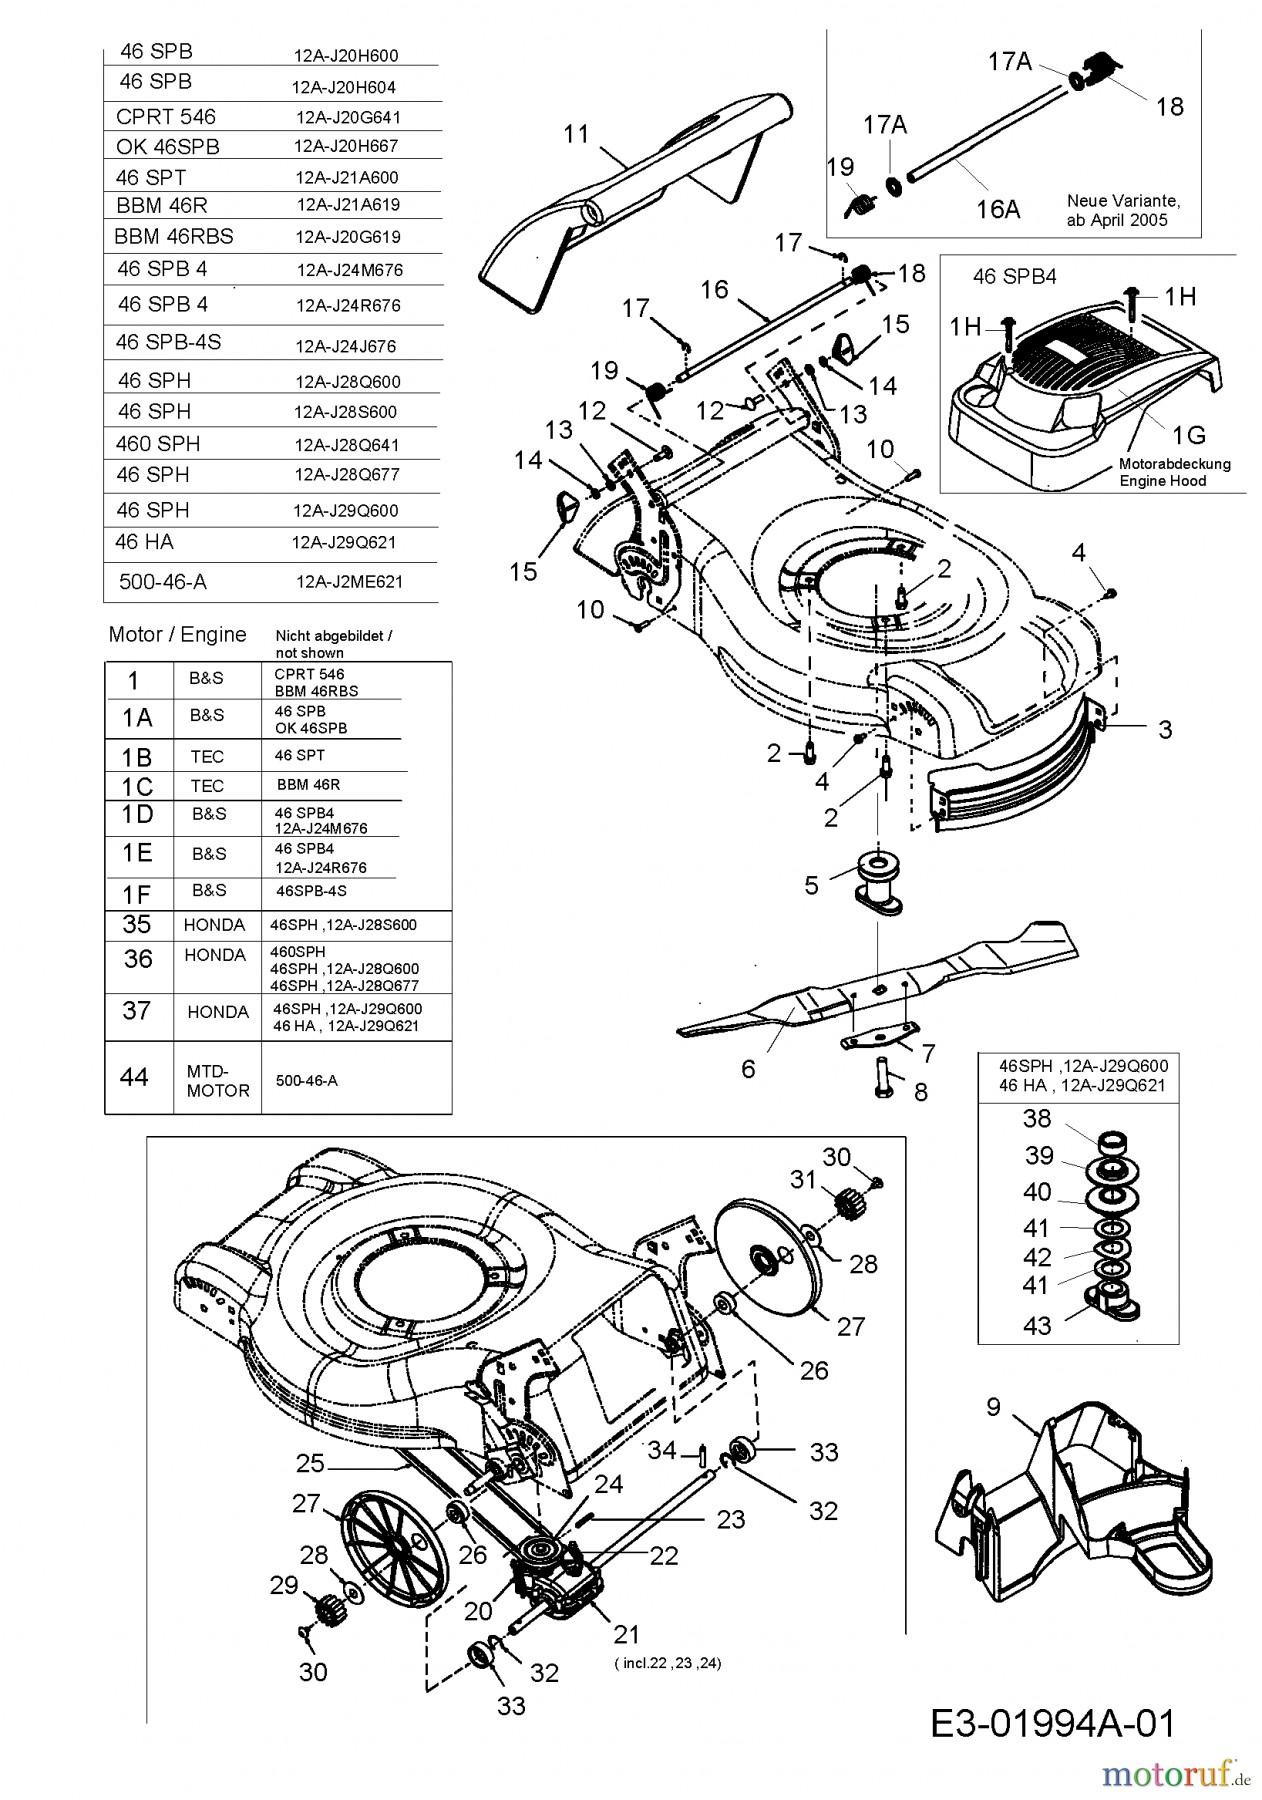 Honda Gc160 Parts Diagram Engine Honda Gcv160 as3h2 5 5h Of Honda Gc160 Parts Diagram